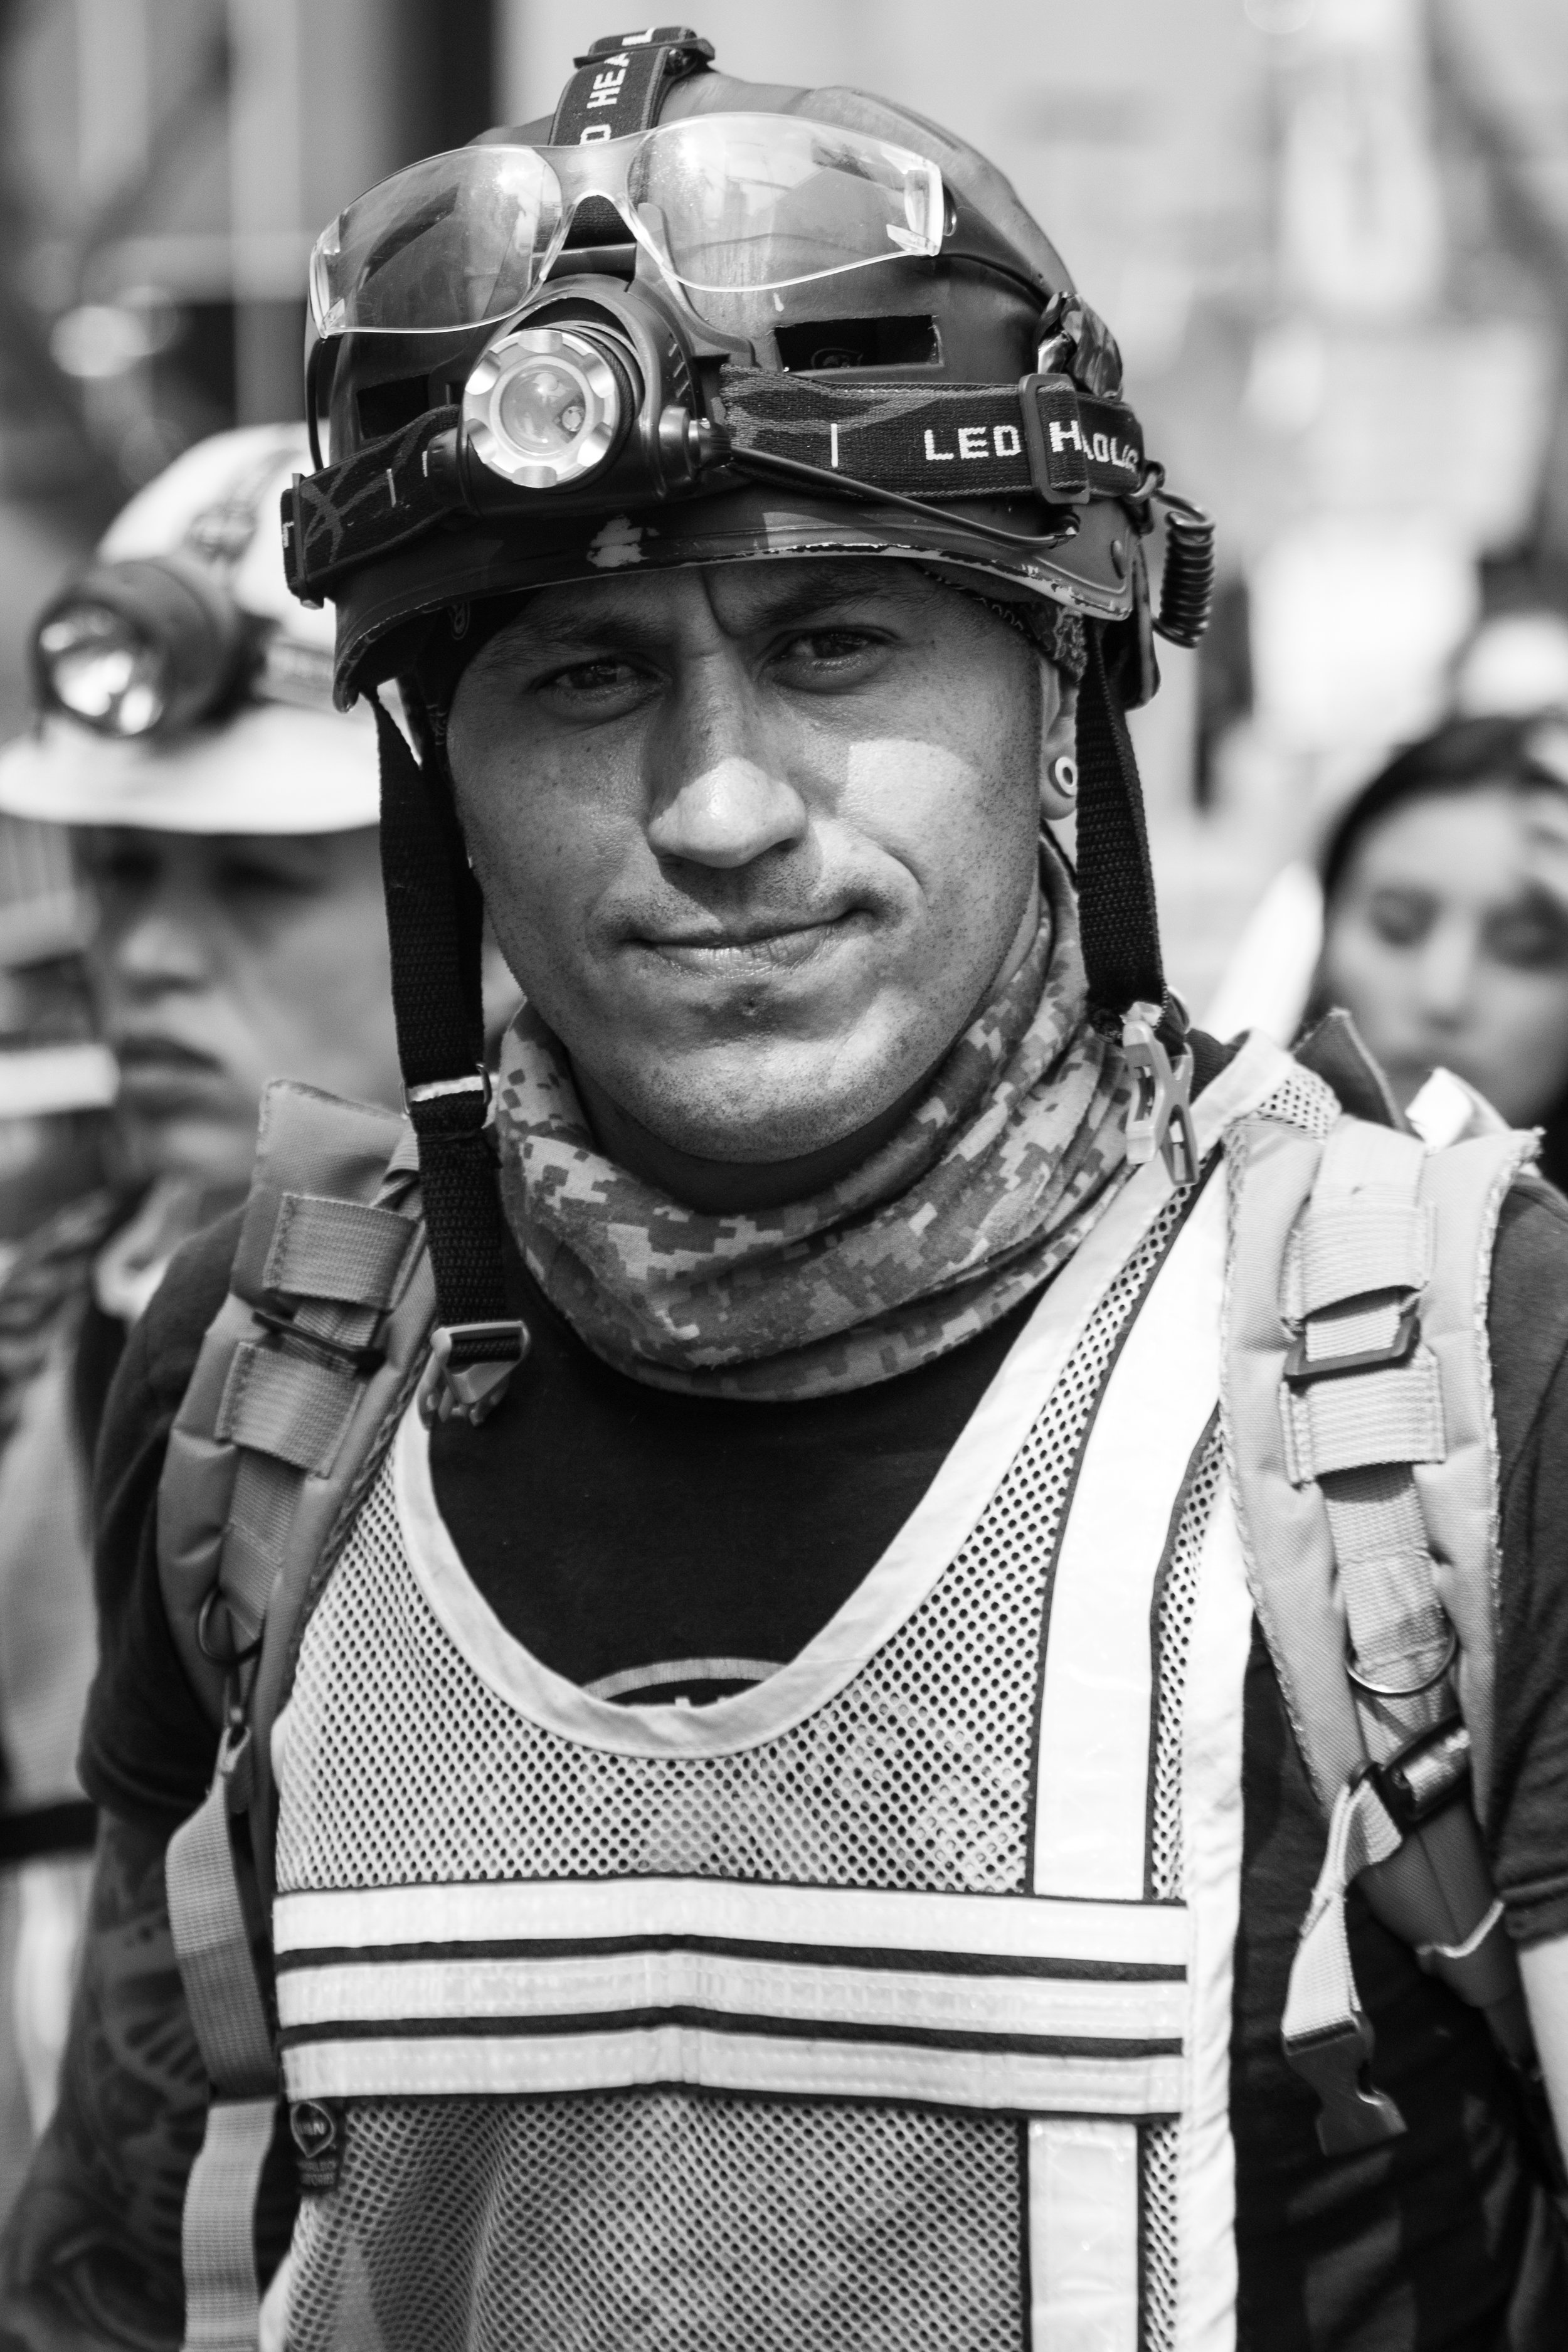 Cory Zimmerman - Rescue Team, CDMX